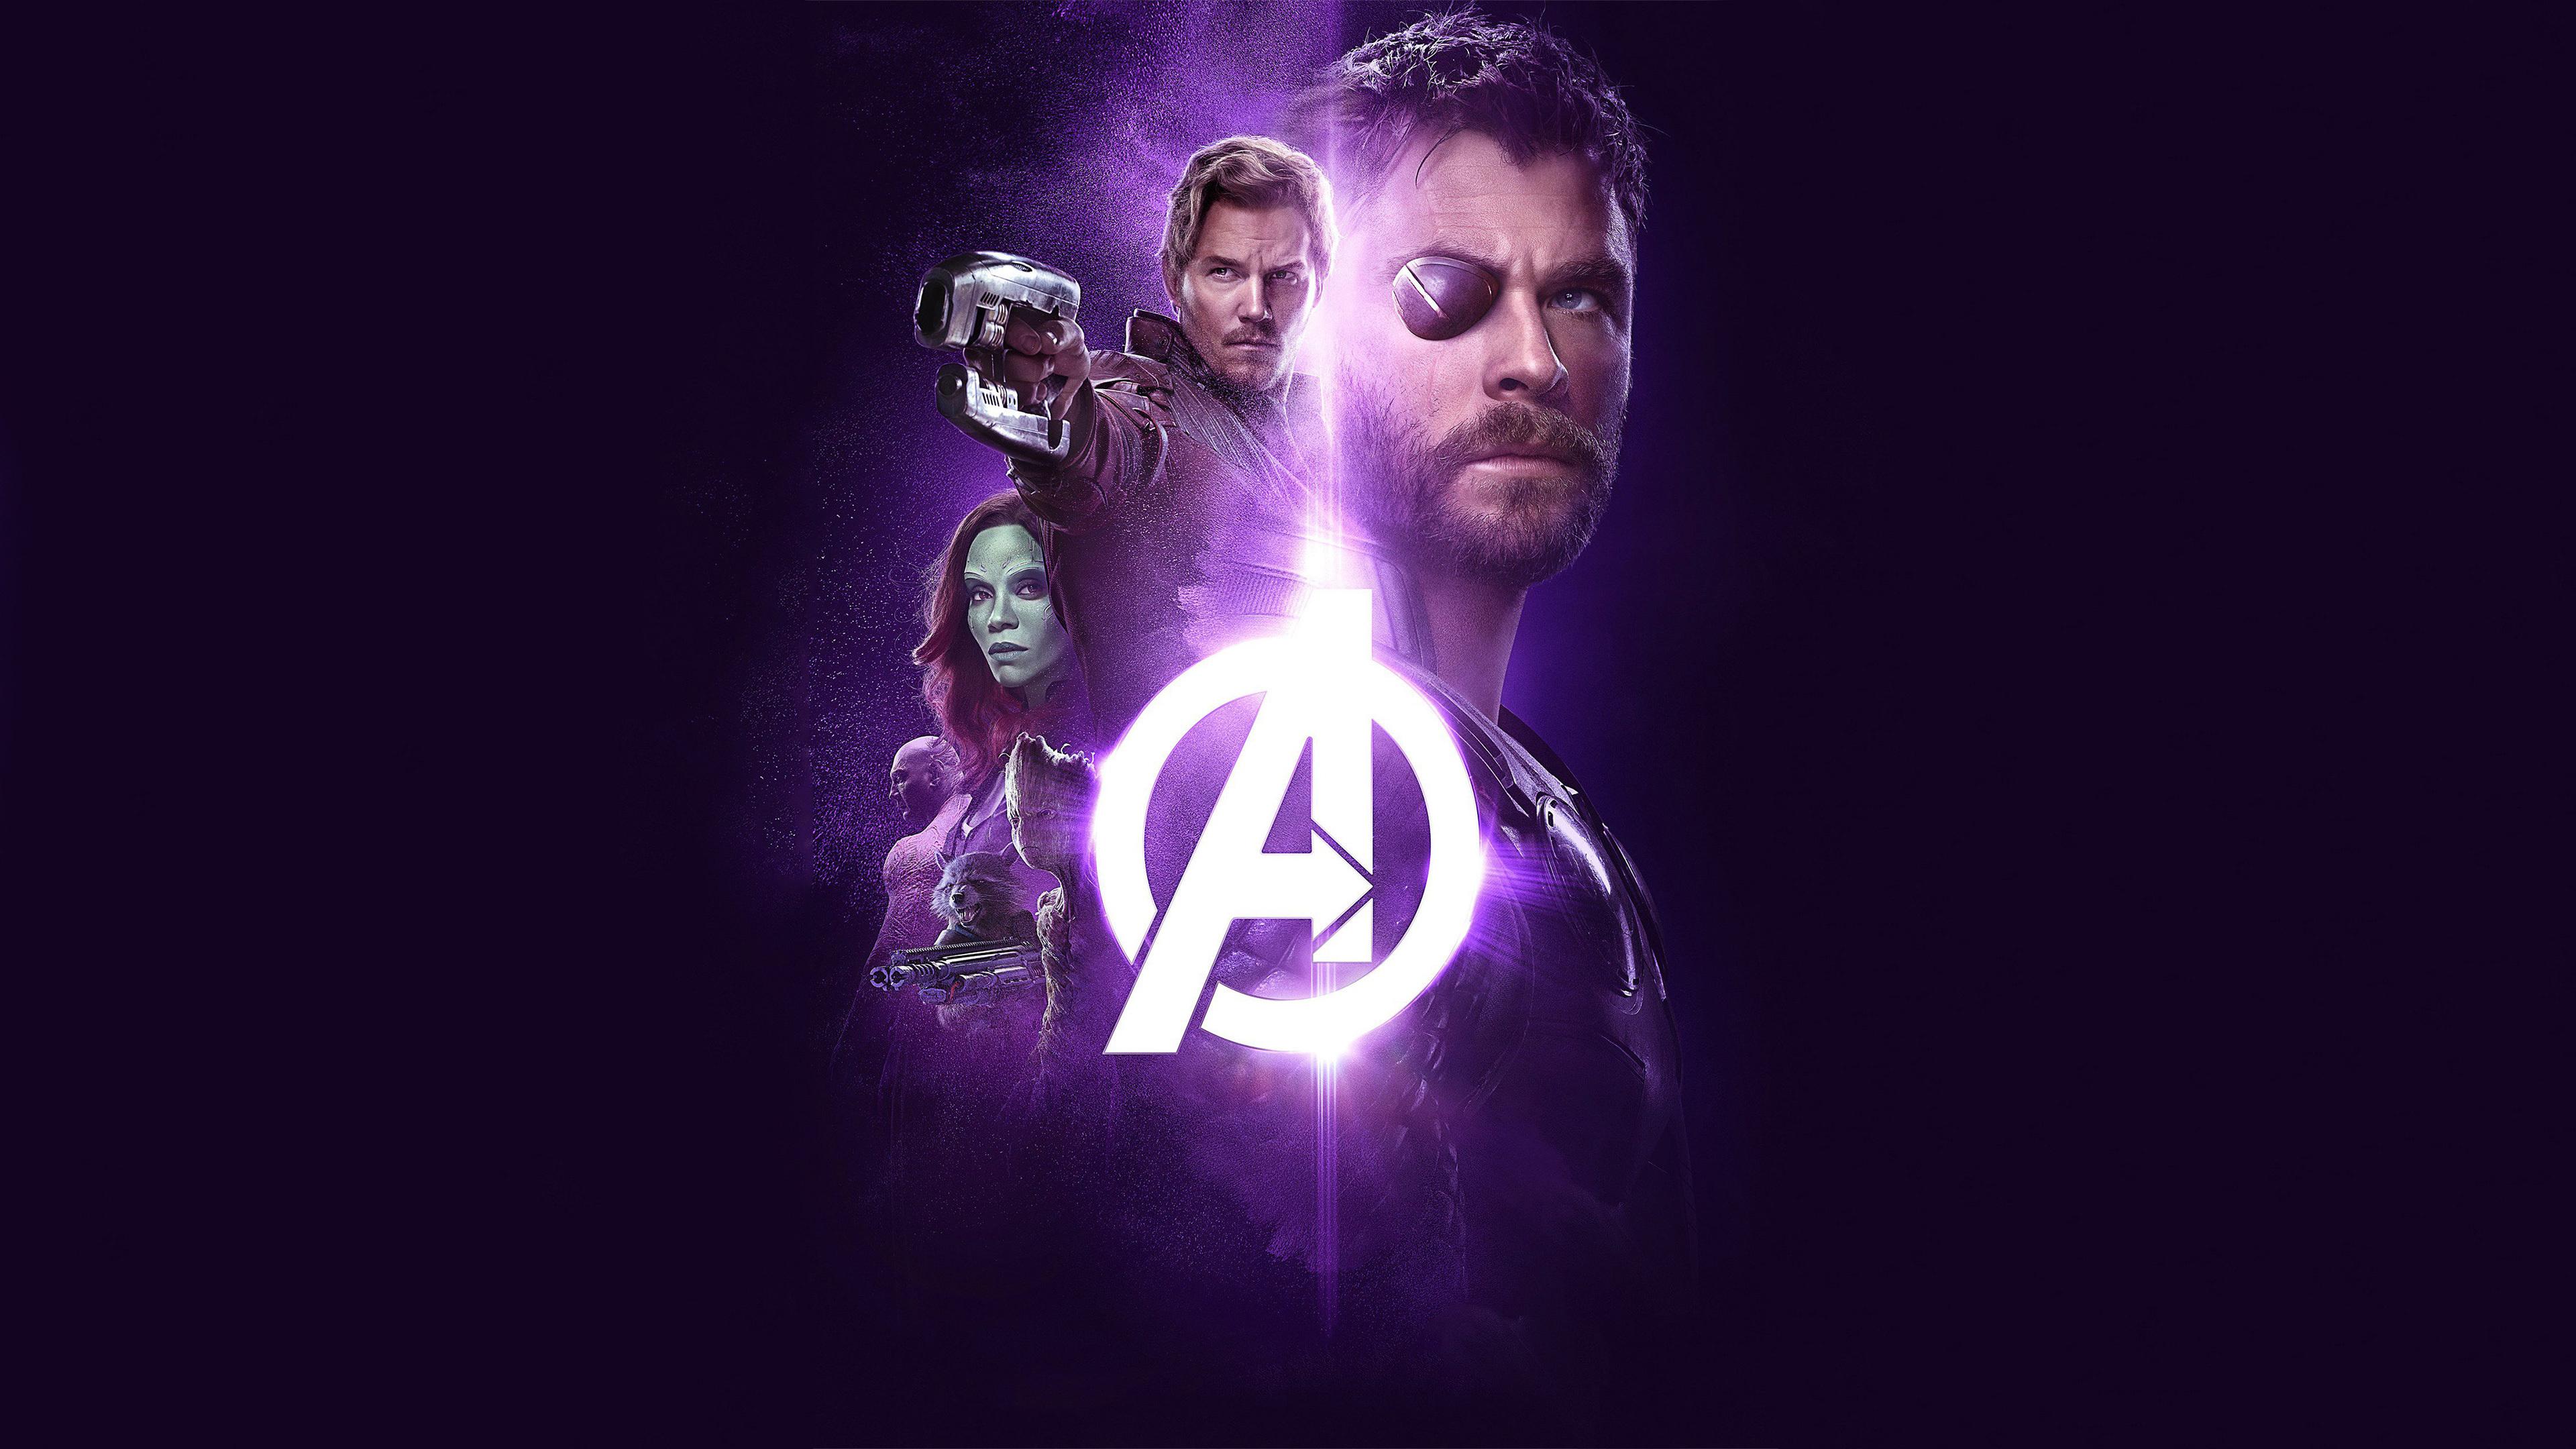 Download 3840x2400 Wallpaper Avengers Infinity War 2018